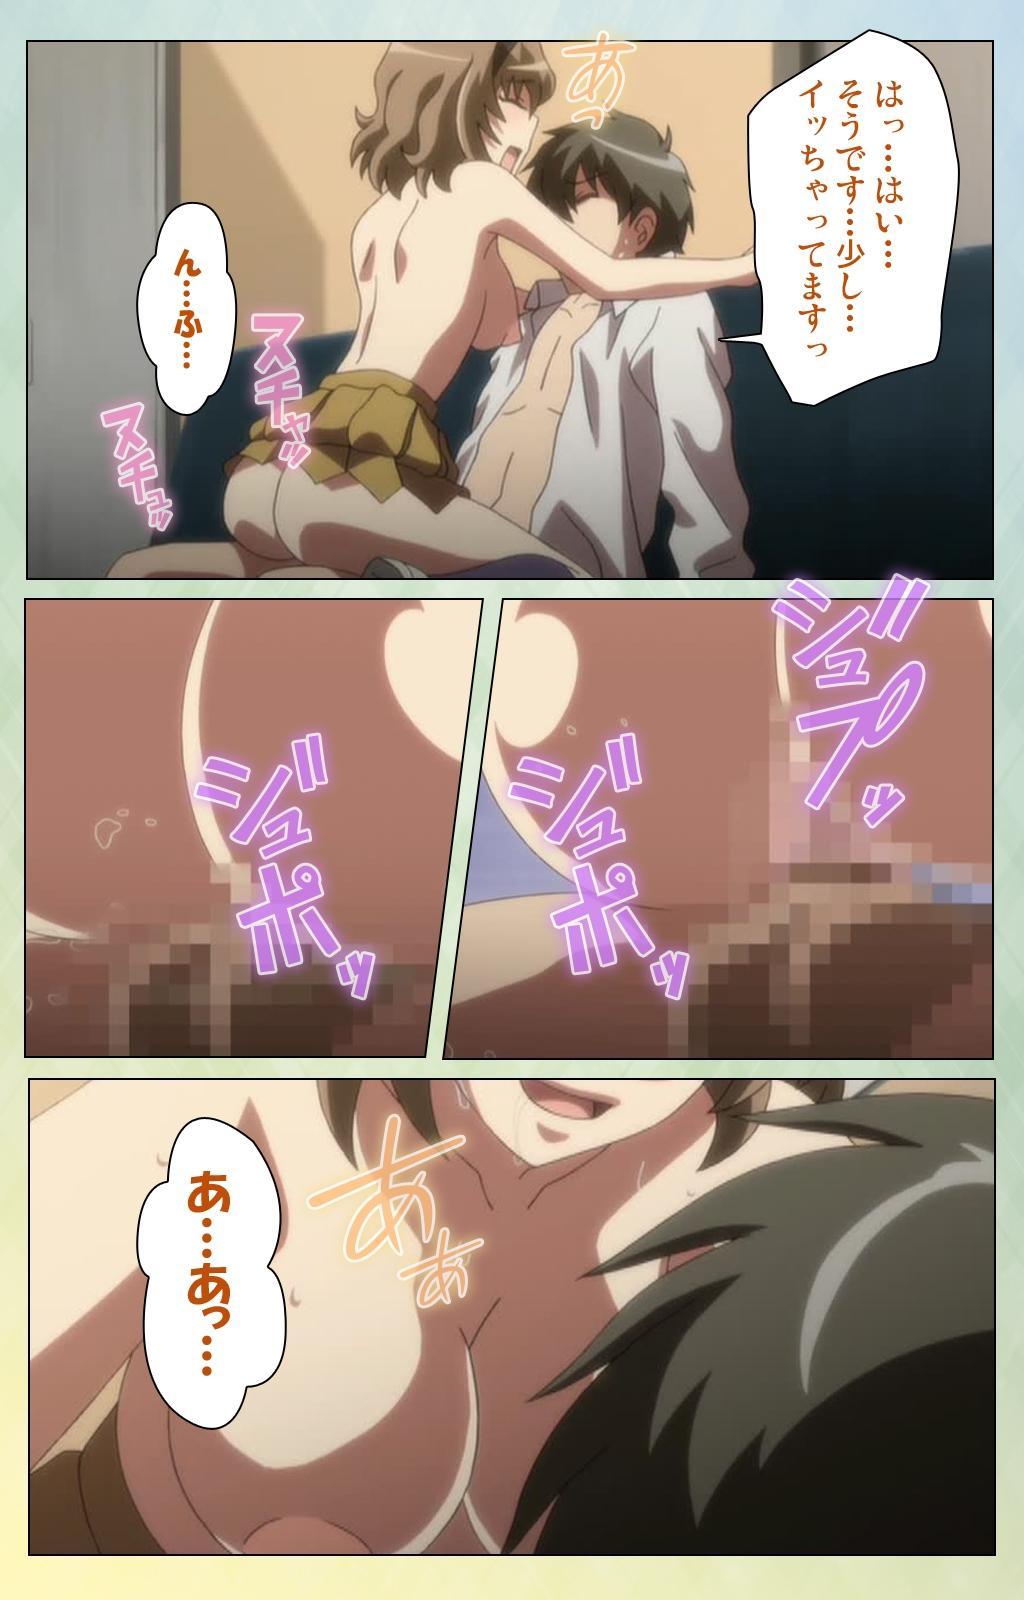 Furueru Kuchibiru fuzzy lips0 Complete Ban 14